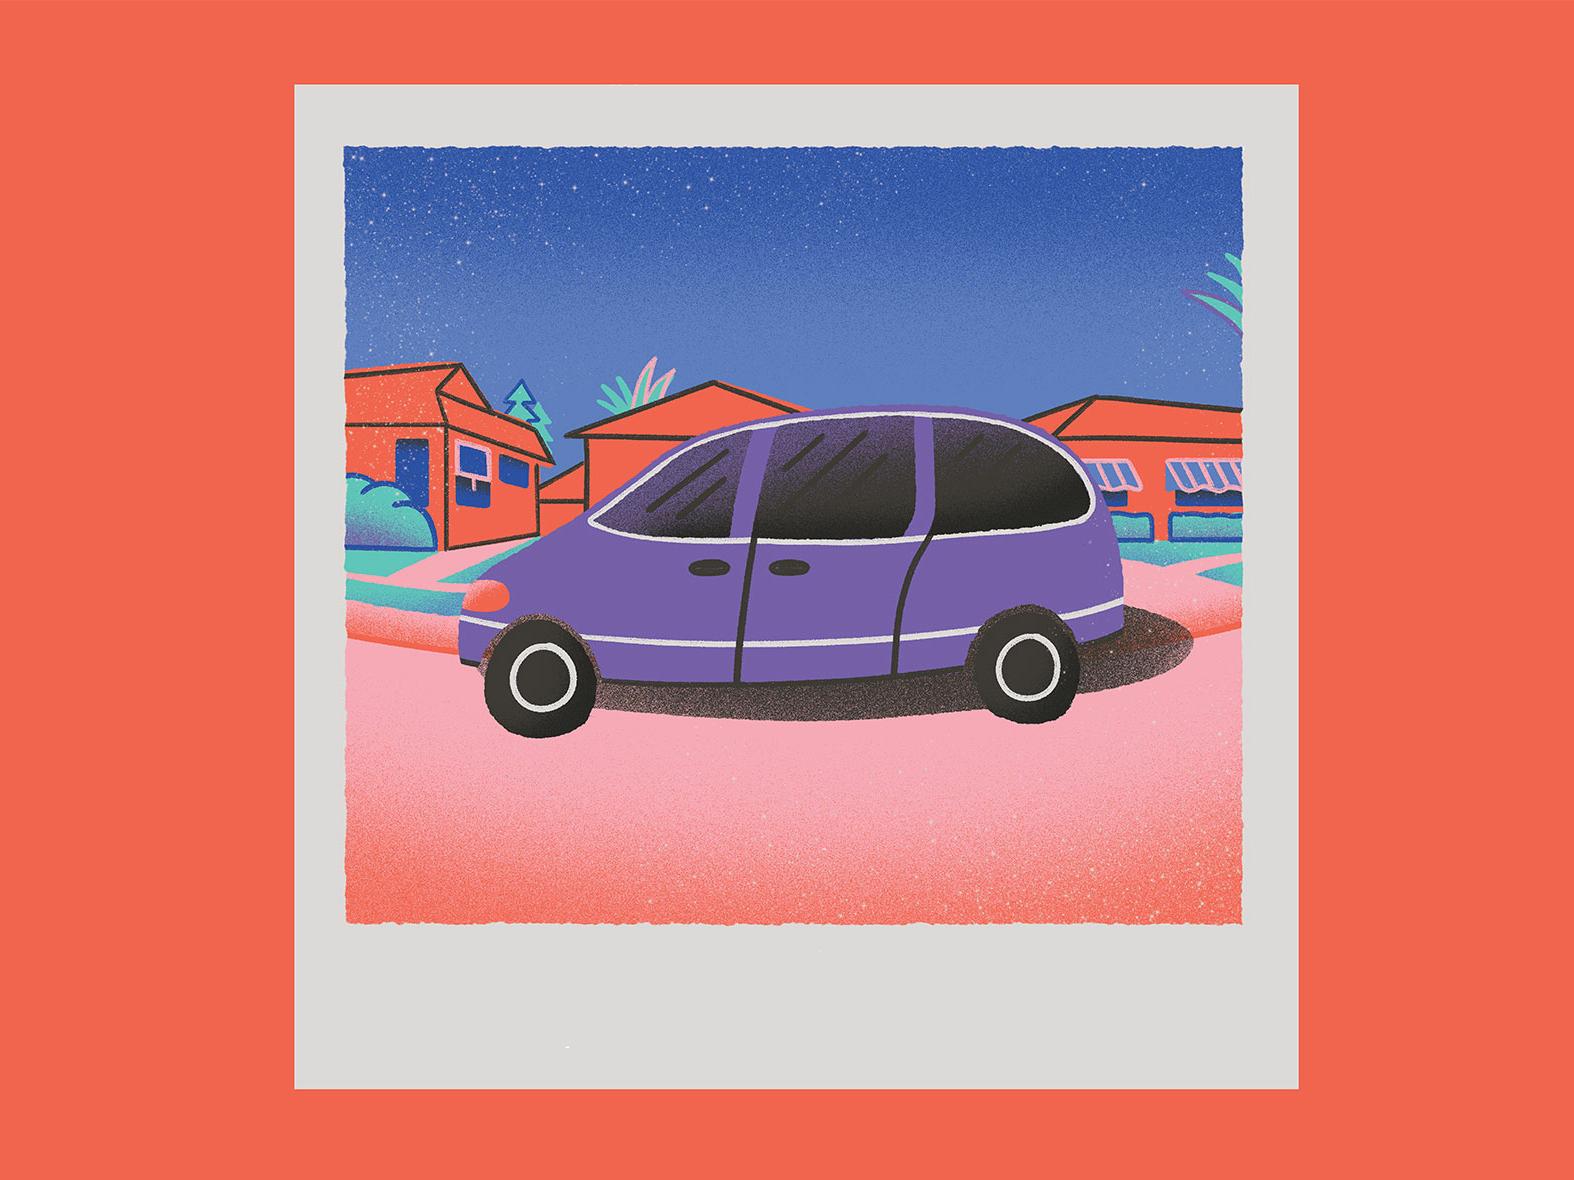 Good Kid, M.A.A.D City — Kendrick Lamar shapes editorial wacky gritty textures characterdesign digitalillustration colourful illustrator photoshop brush photoshop kyle webster illustration design